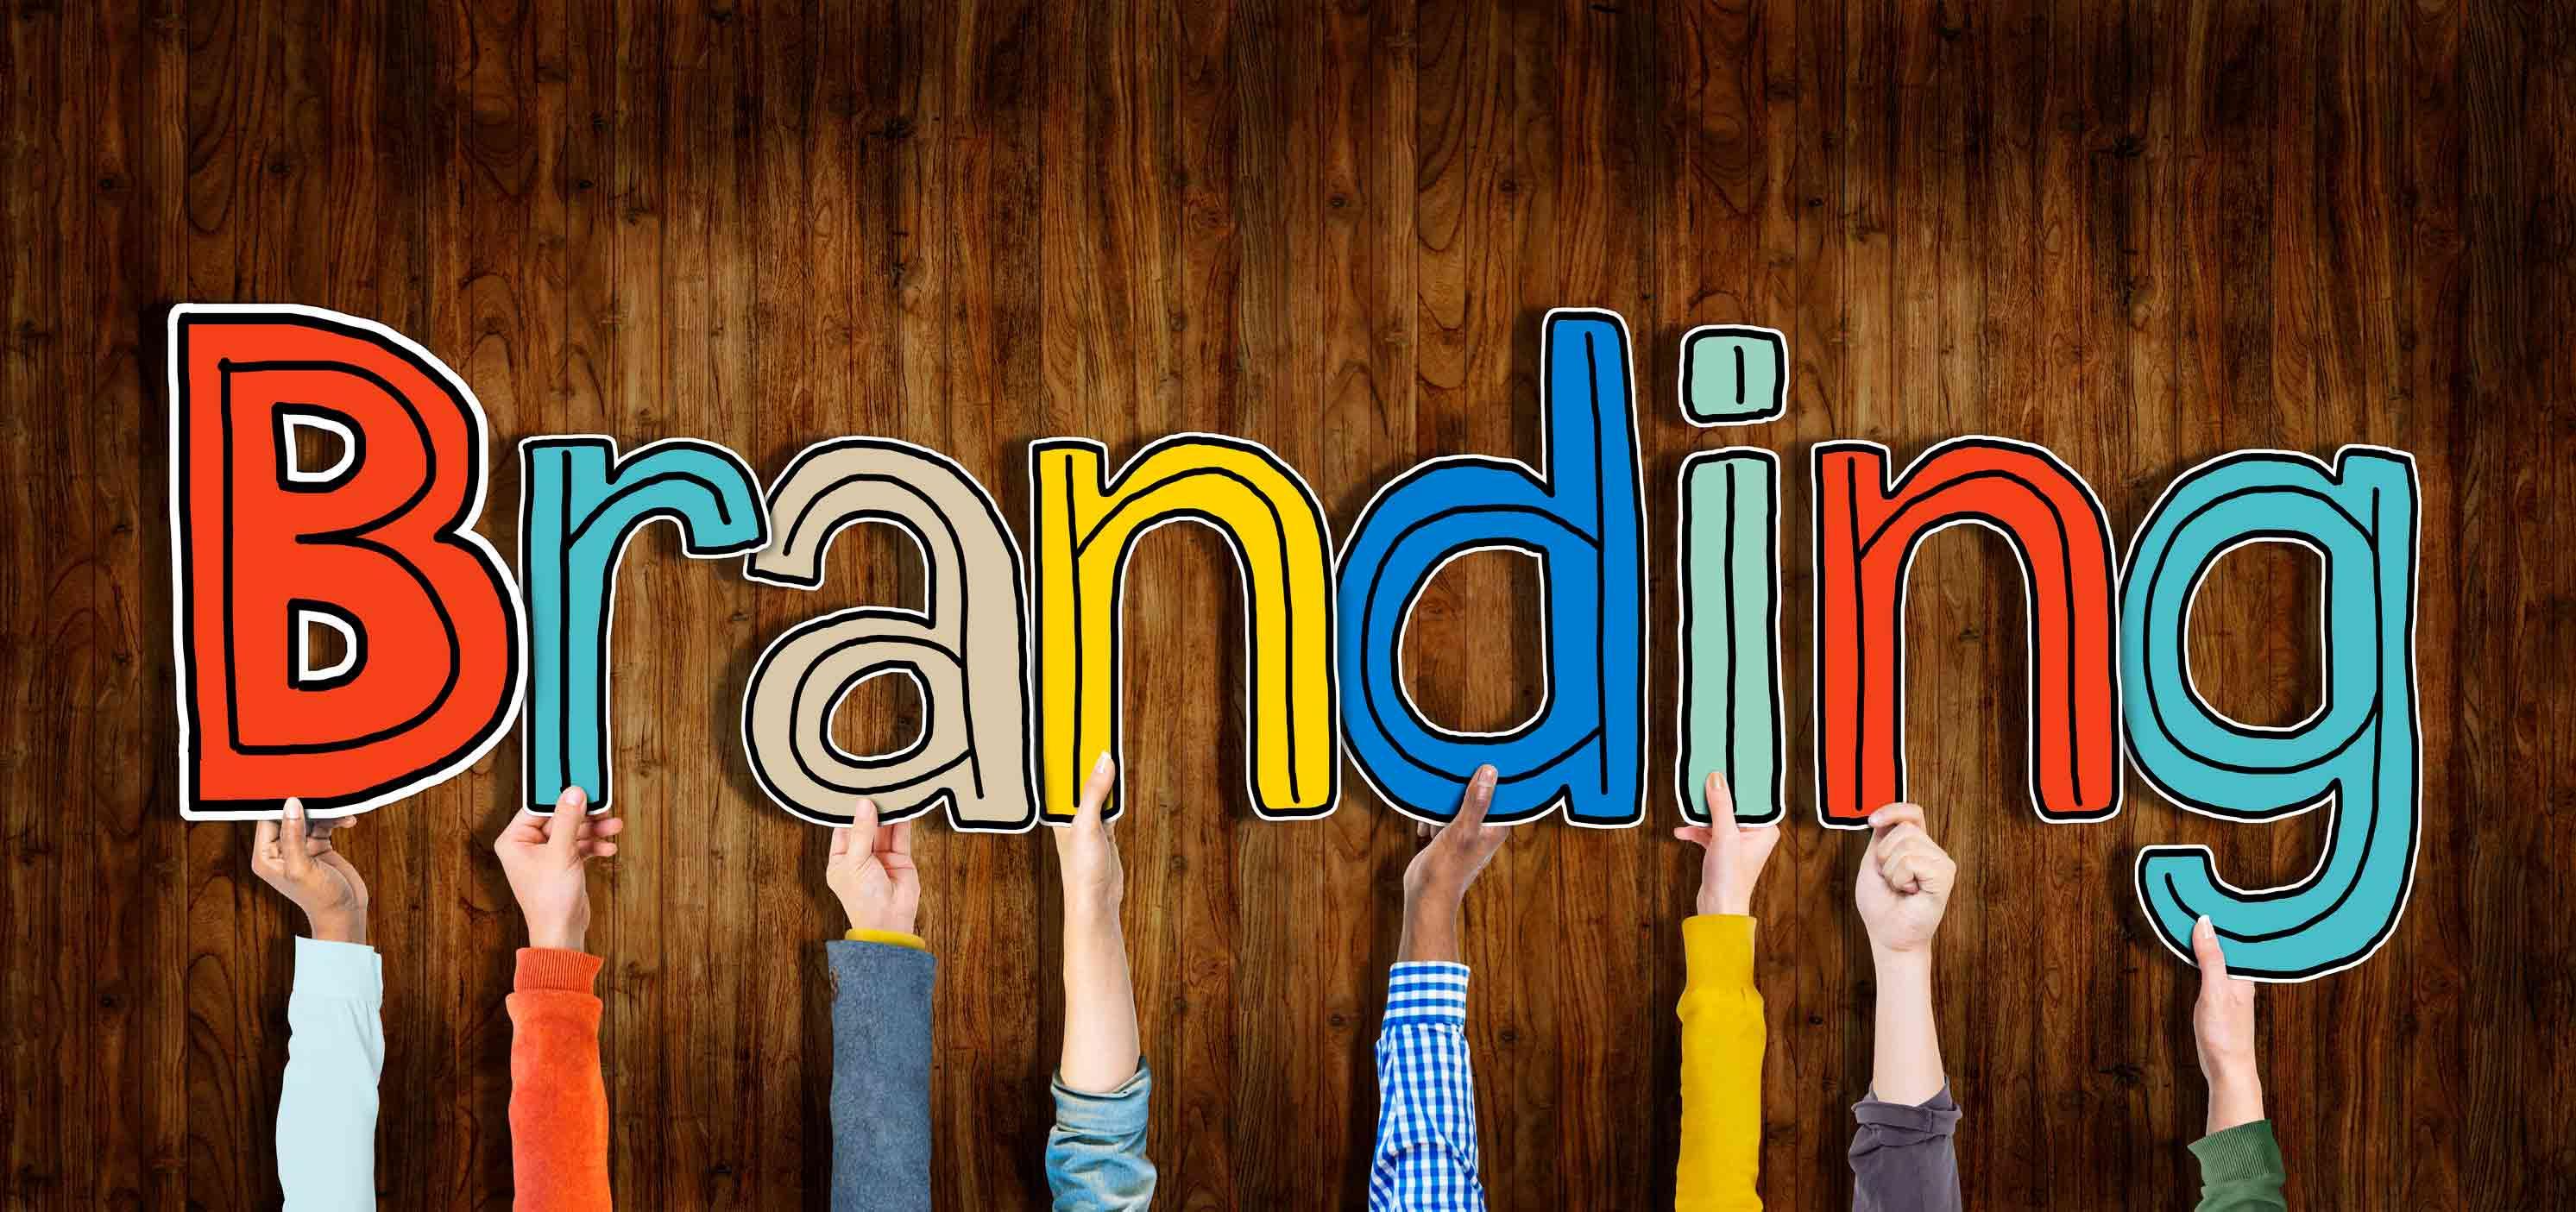 Essential-truths-in-higher-ed-branding